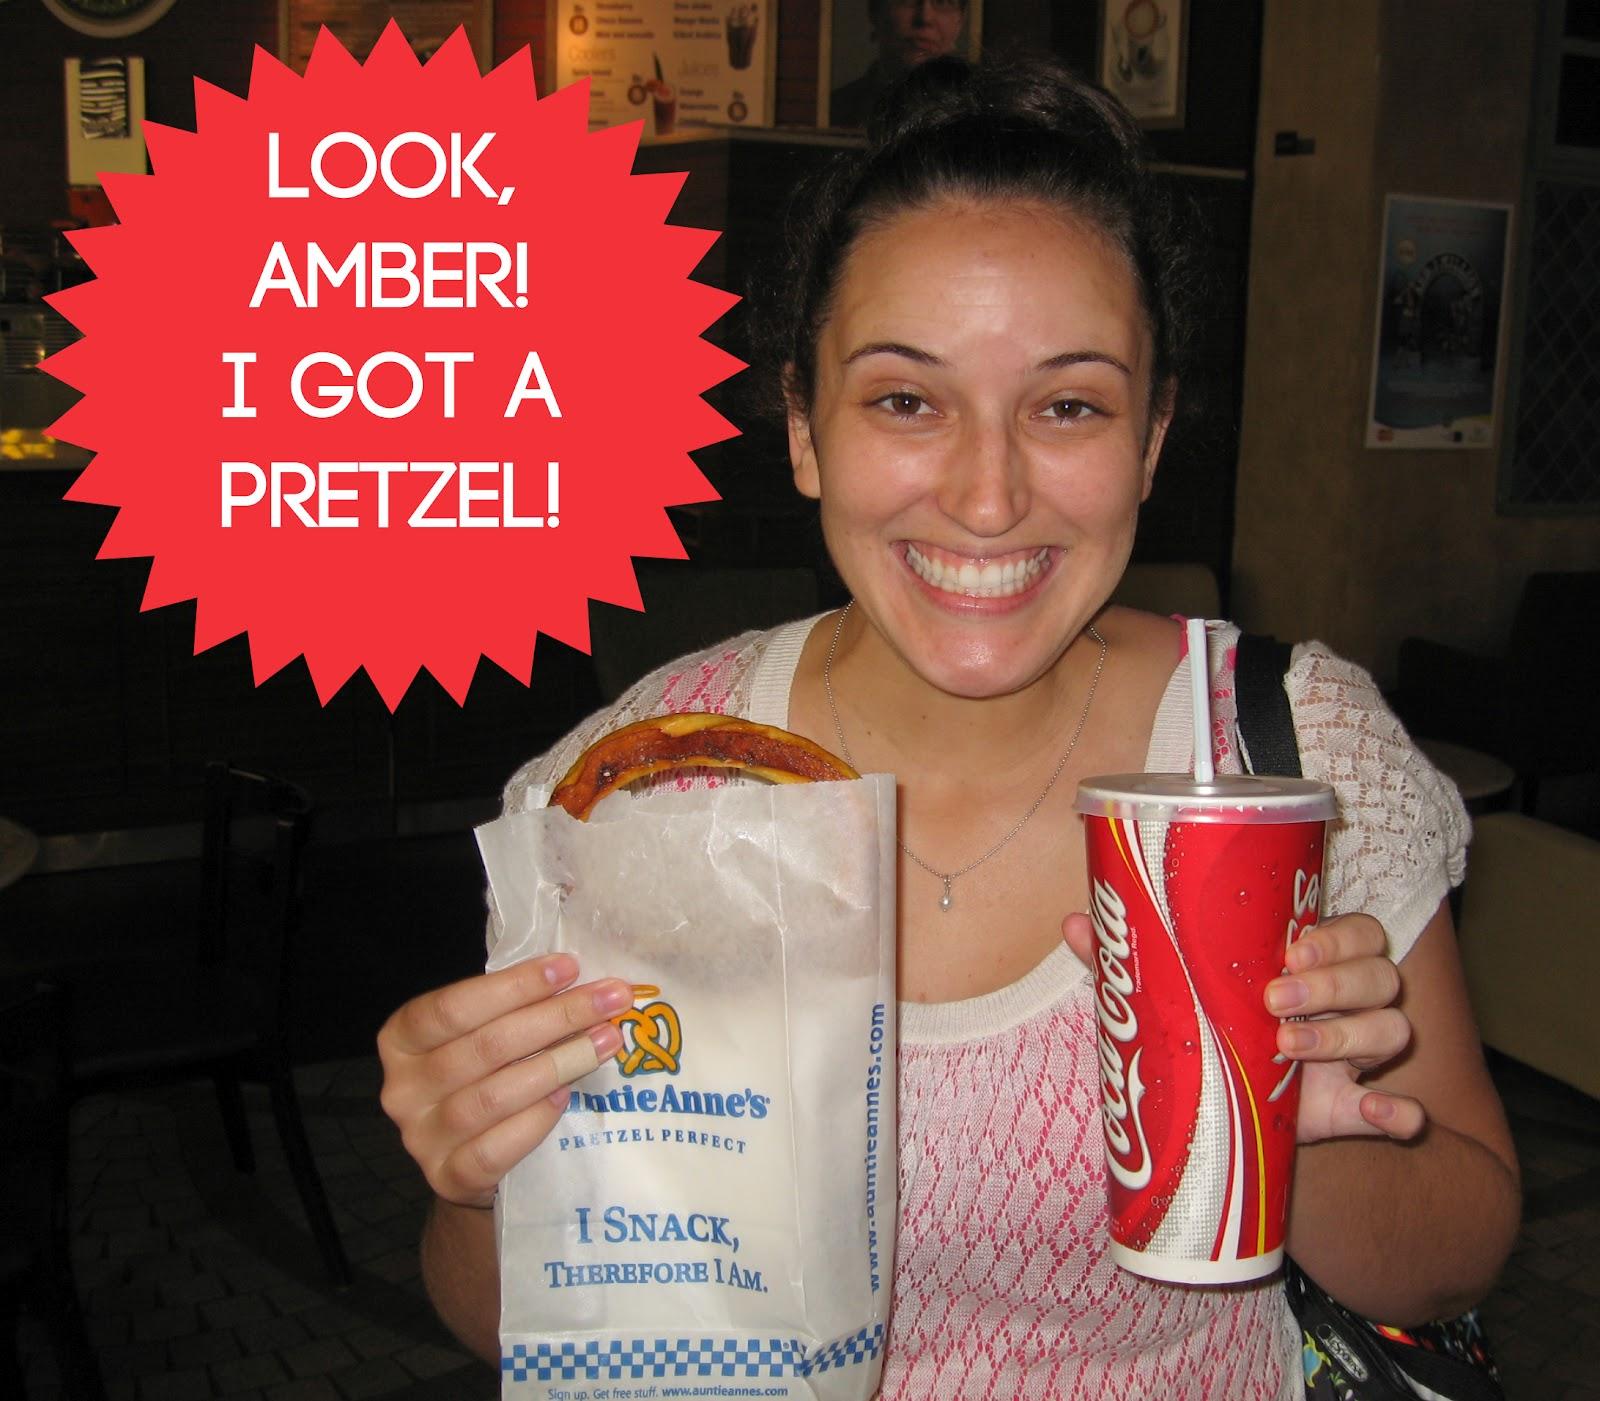 http://2.bp.blogspot.com/-ff10Y_CLHgY/UAFrmcYlSbI/AAAAAAAACEo/0lDntdd7yh8/s1600/babymoon+pretzel.jpg